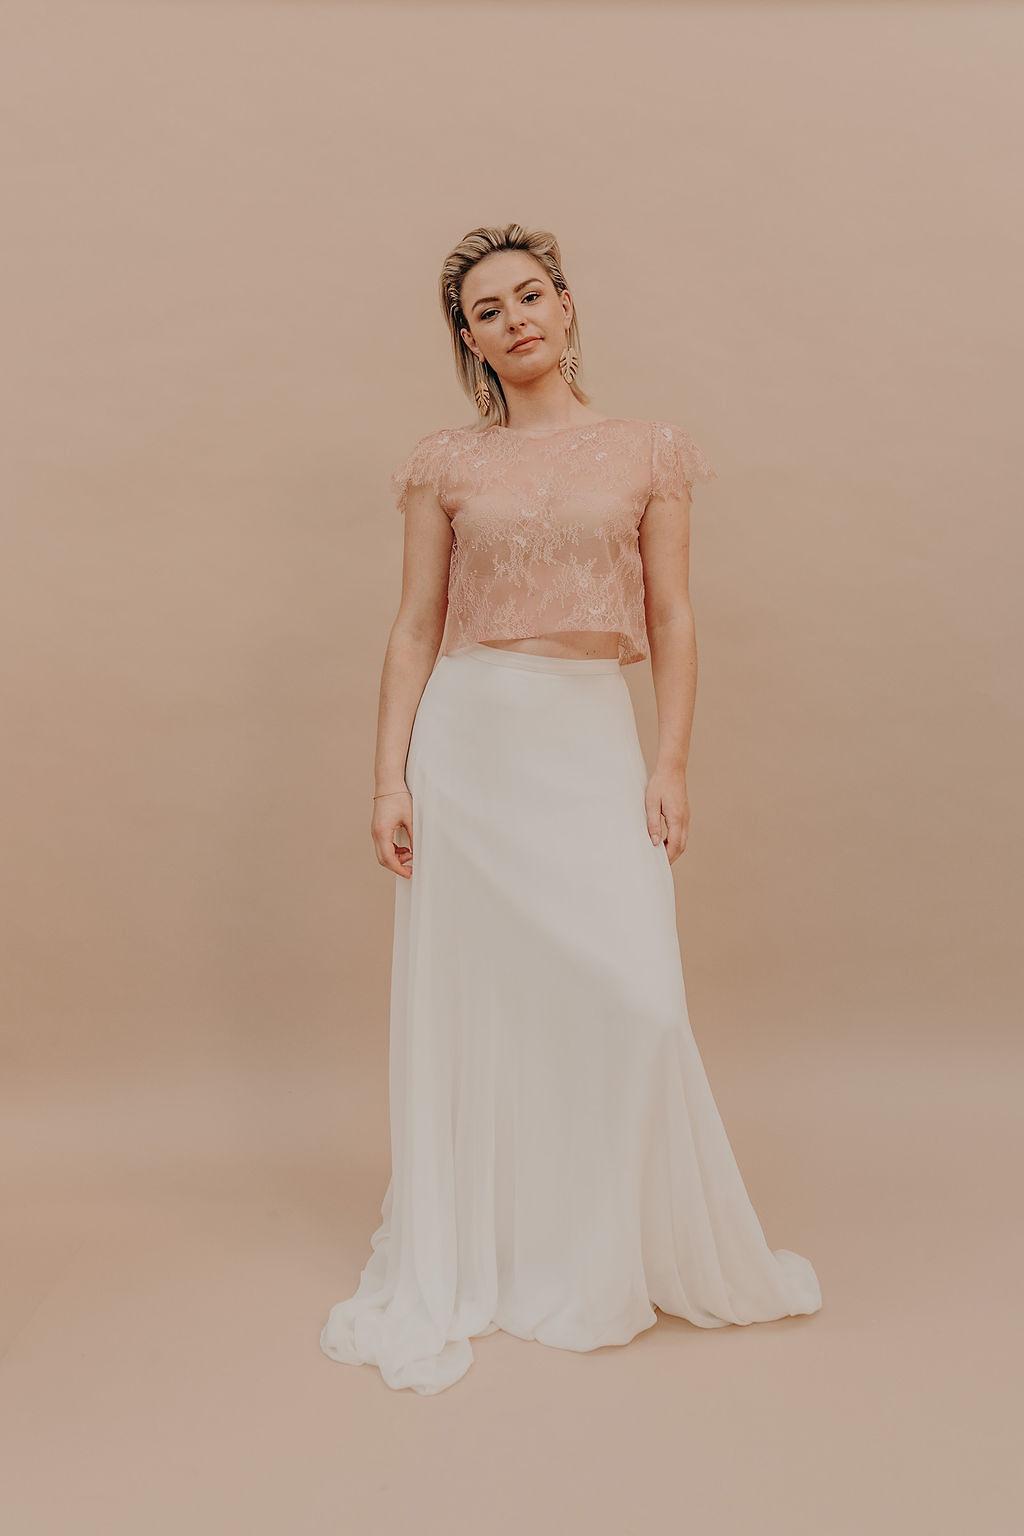 4_top_dv_mariage_créateur_lyon_rhône_alpes